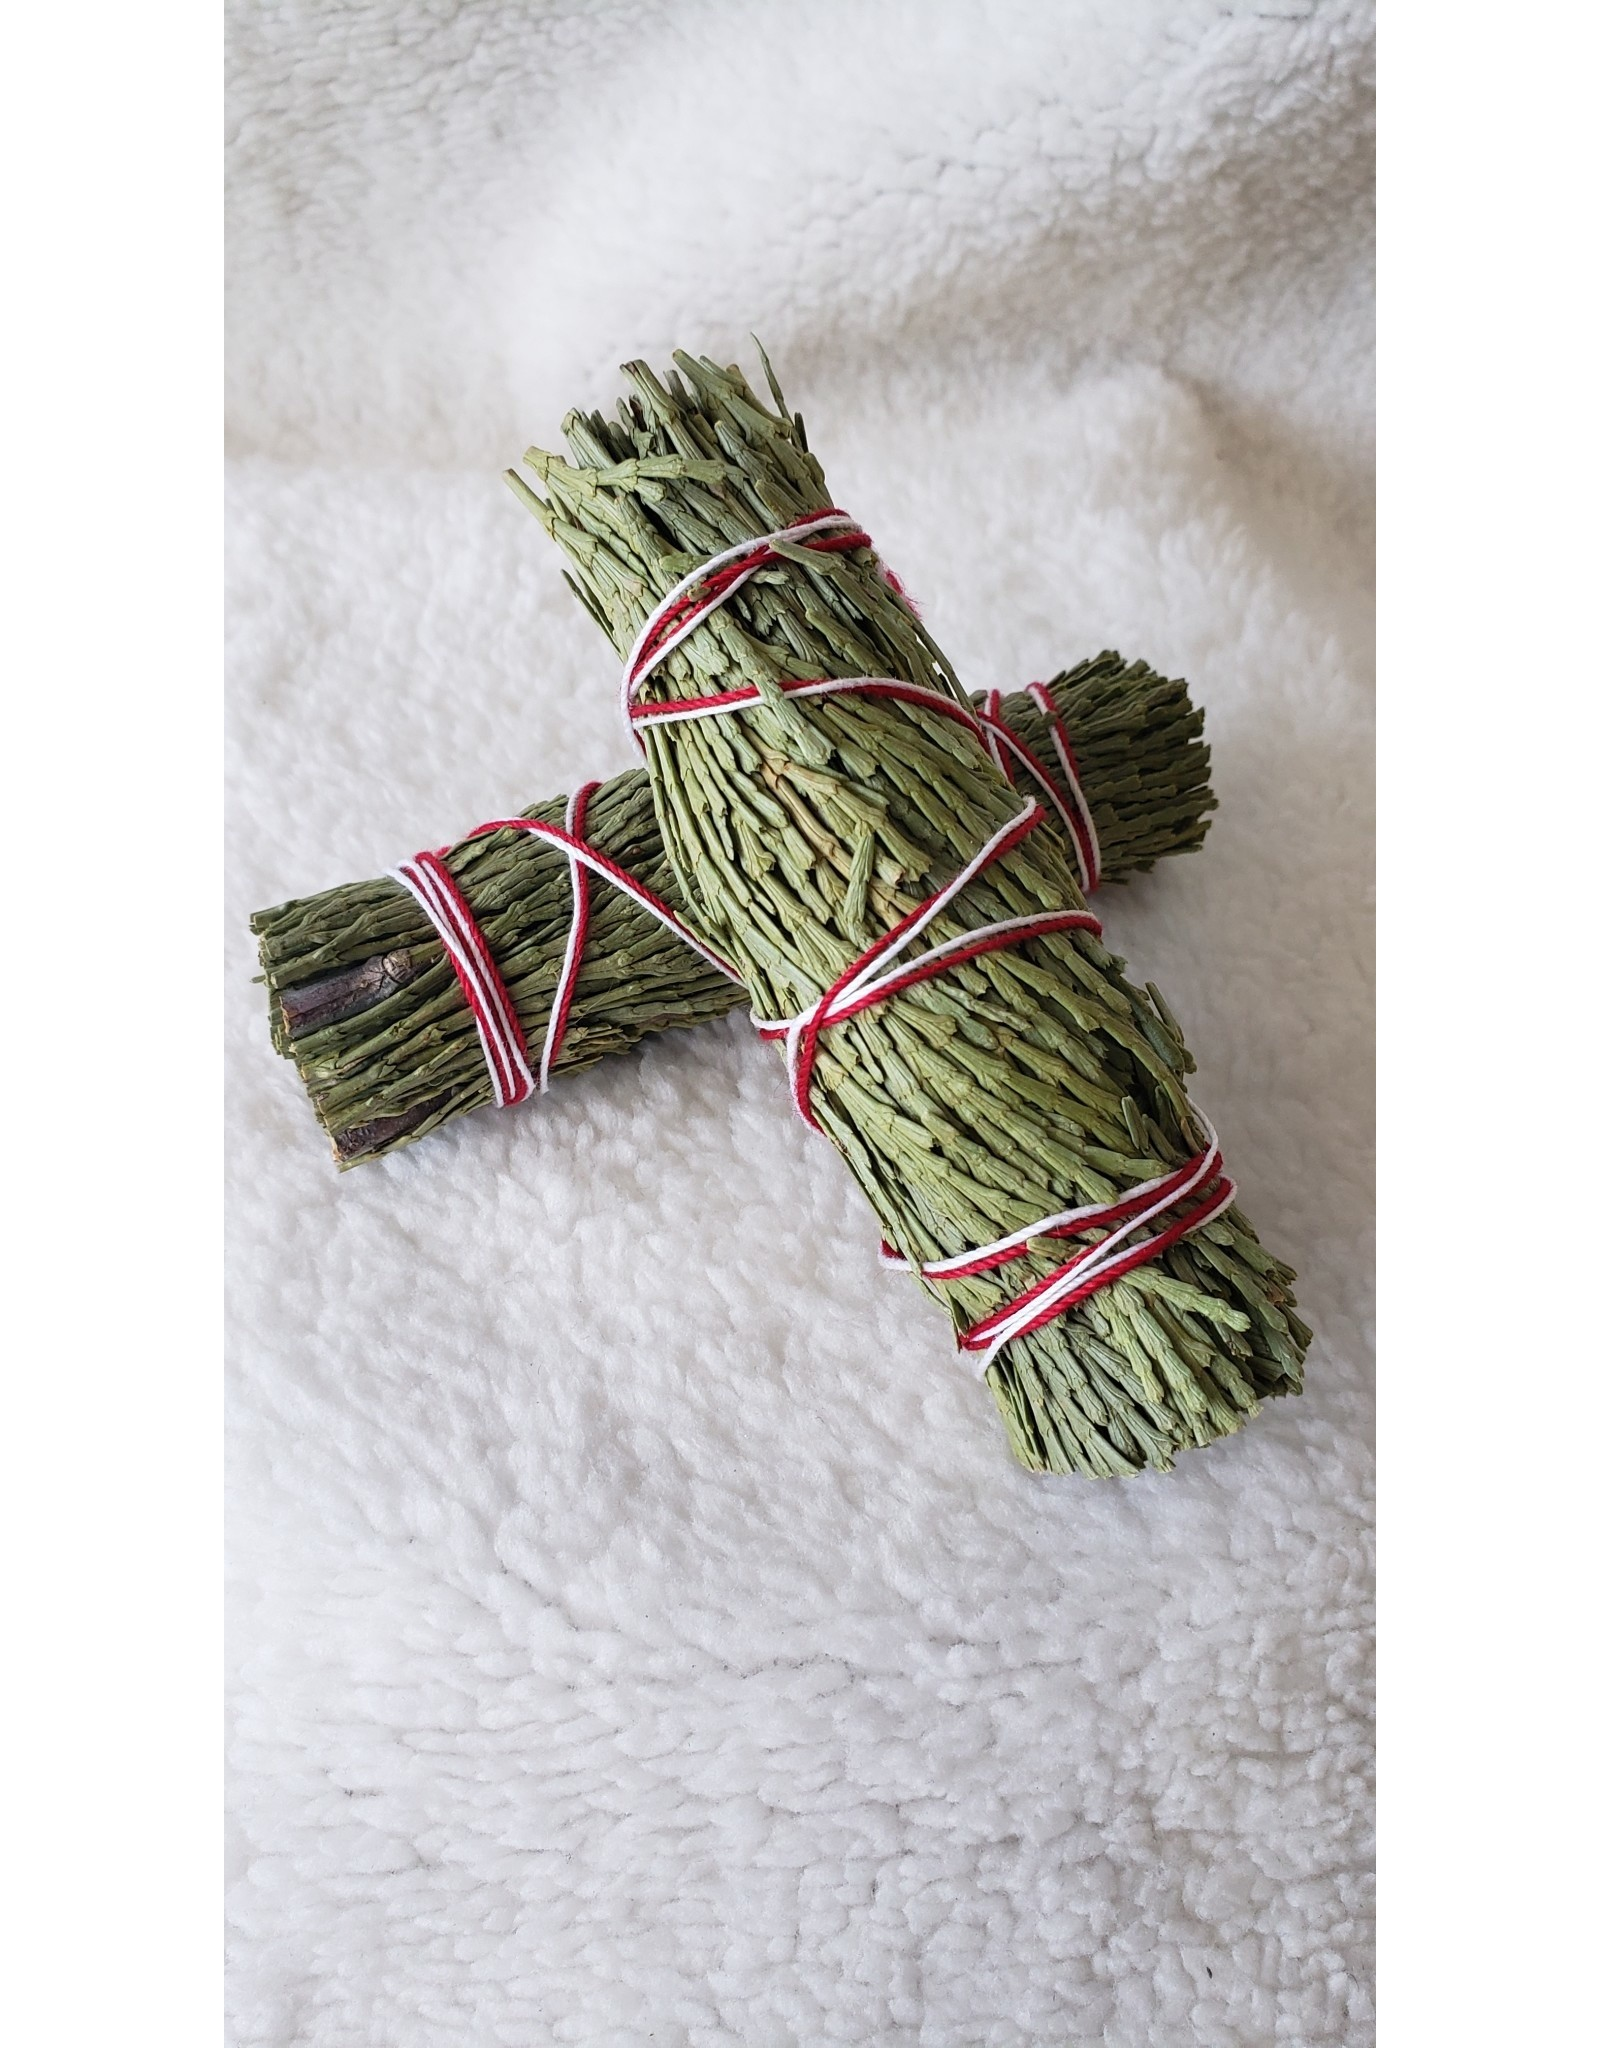 Cedar Smudge Sticks